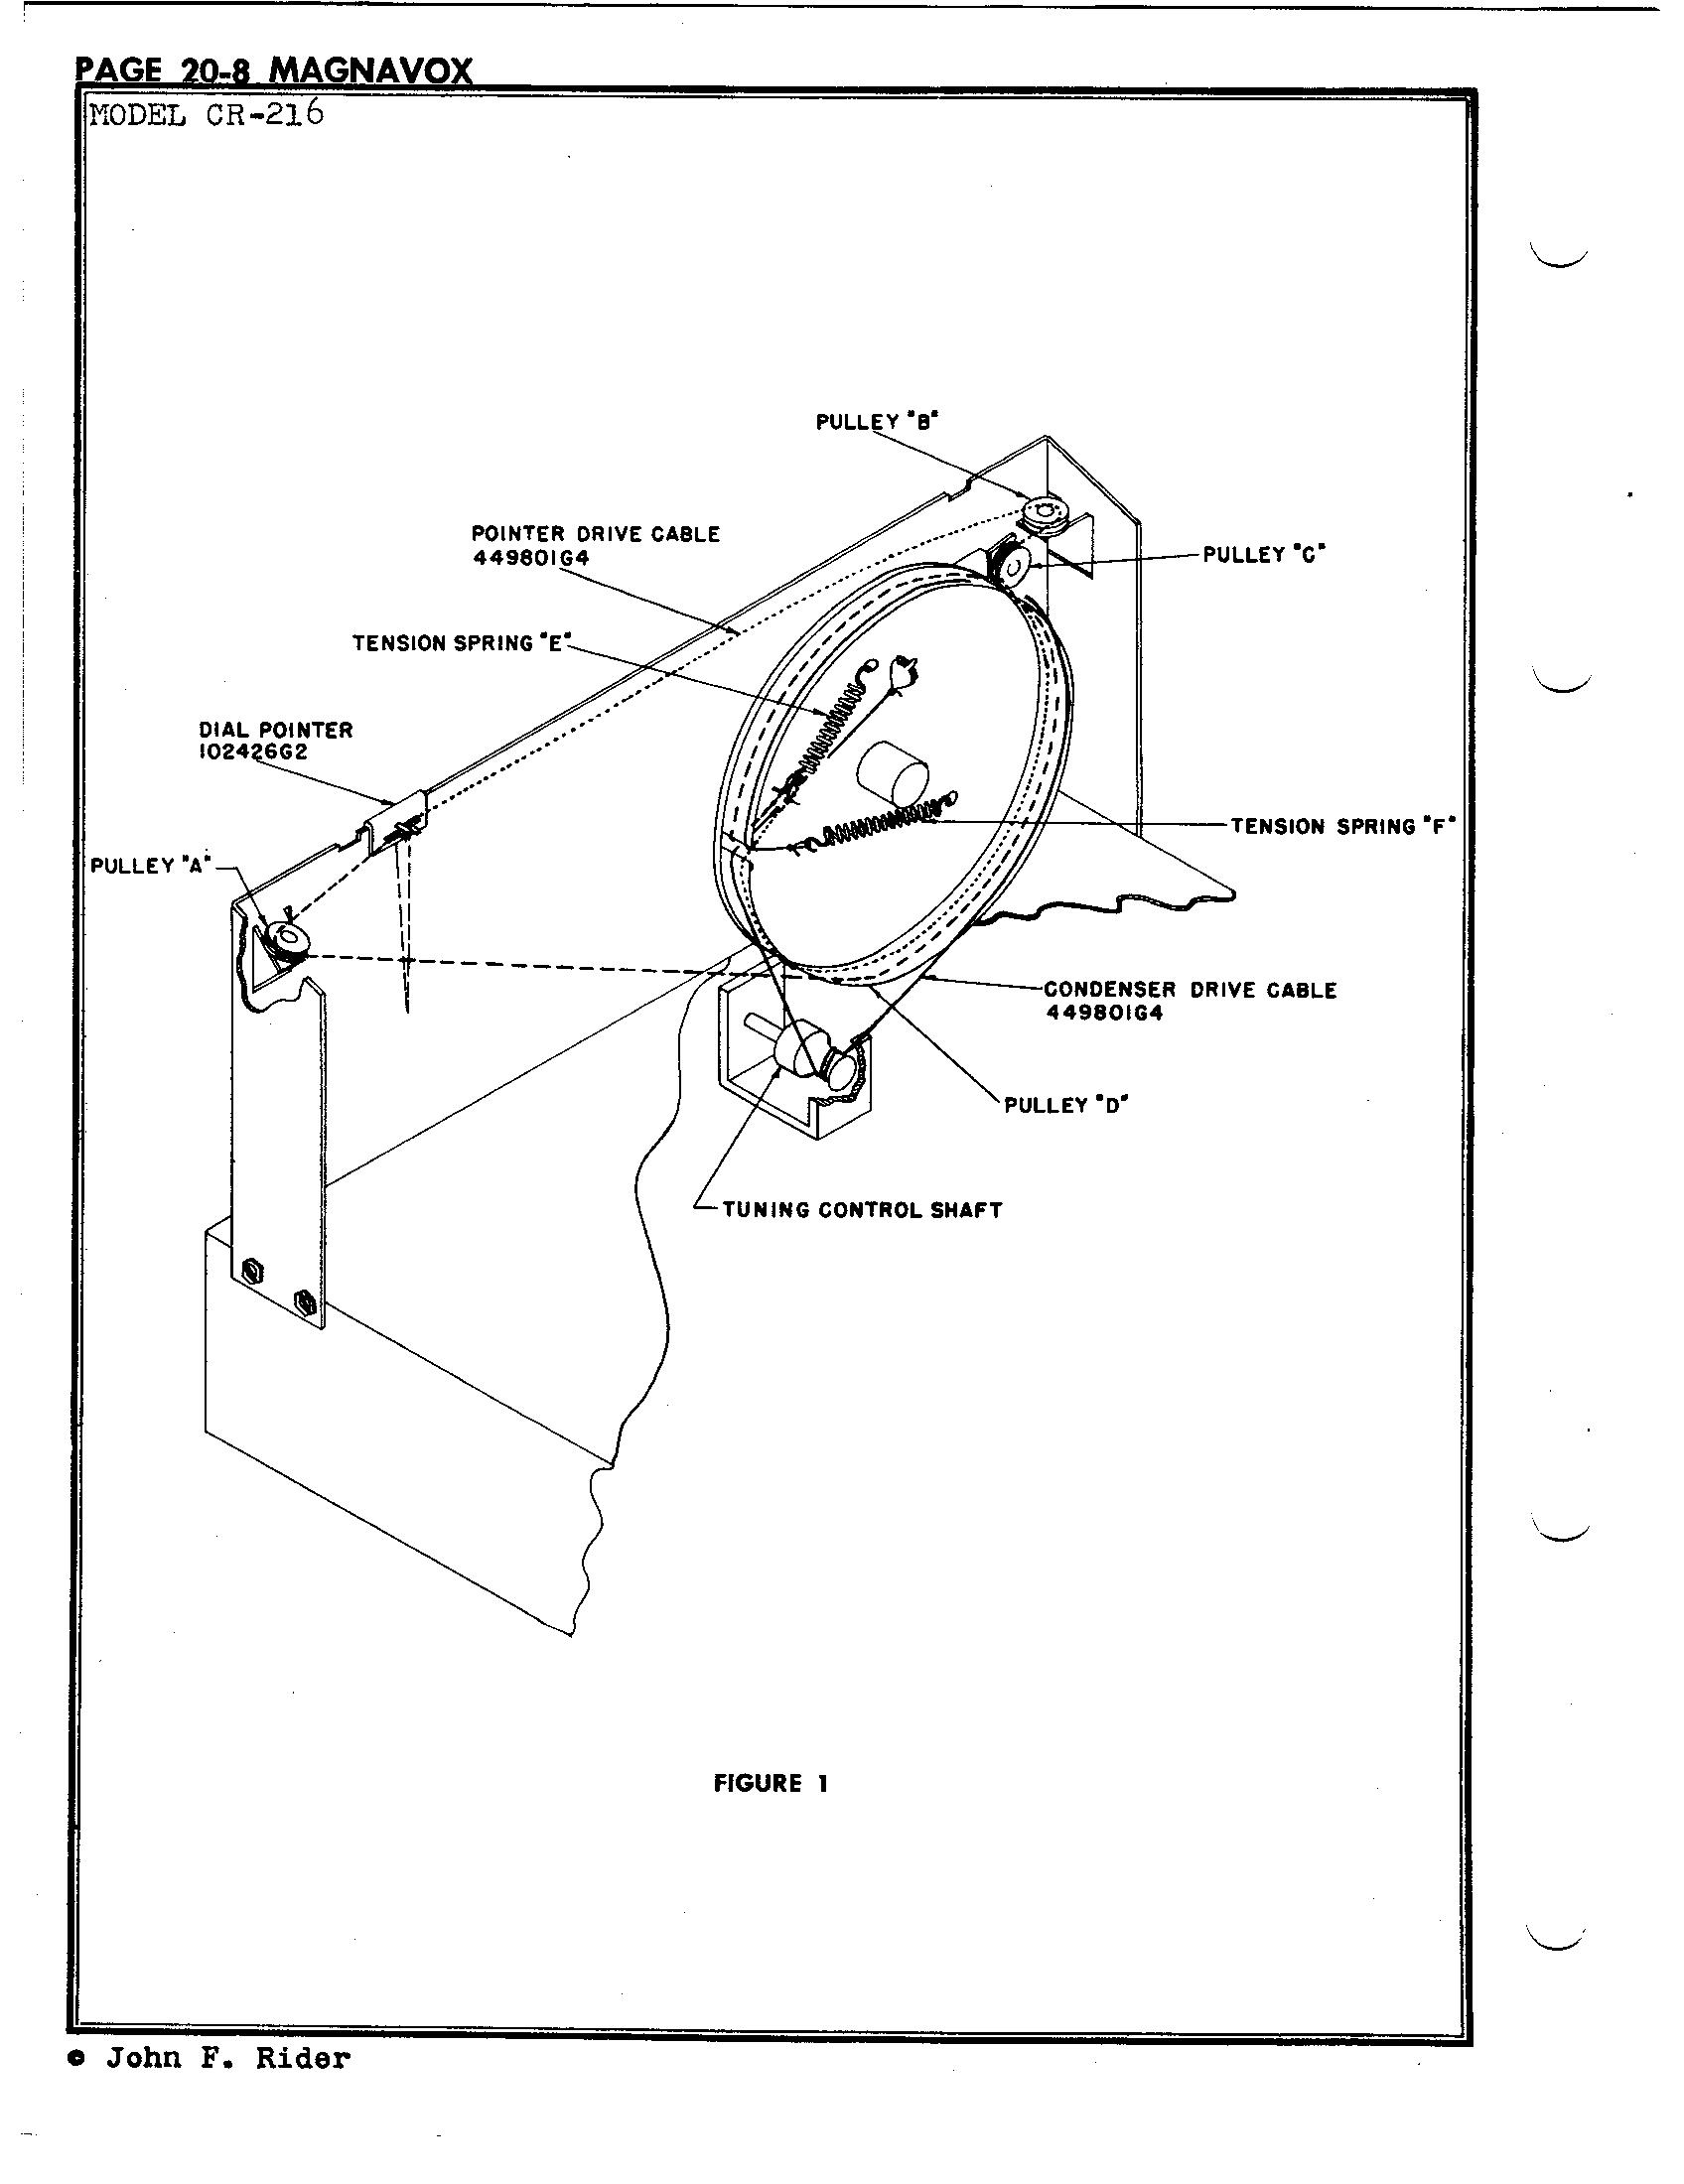 Magnavox Schematic Diagrams | Wiring Diagram Database on